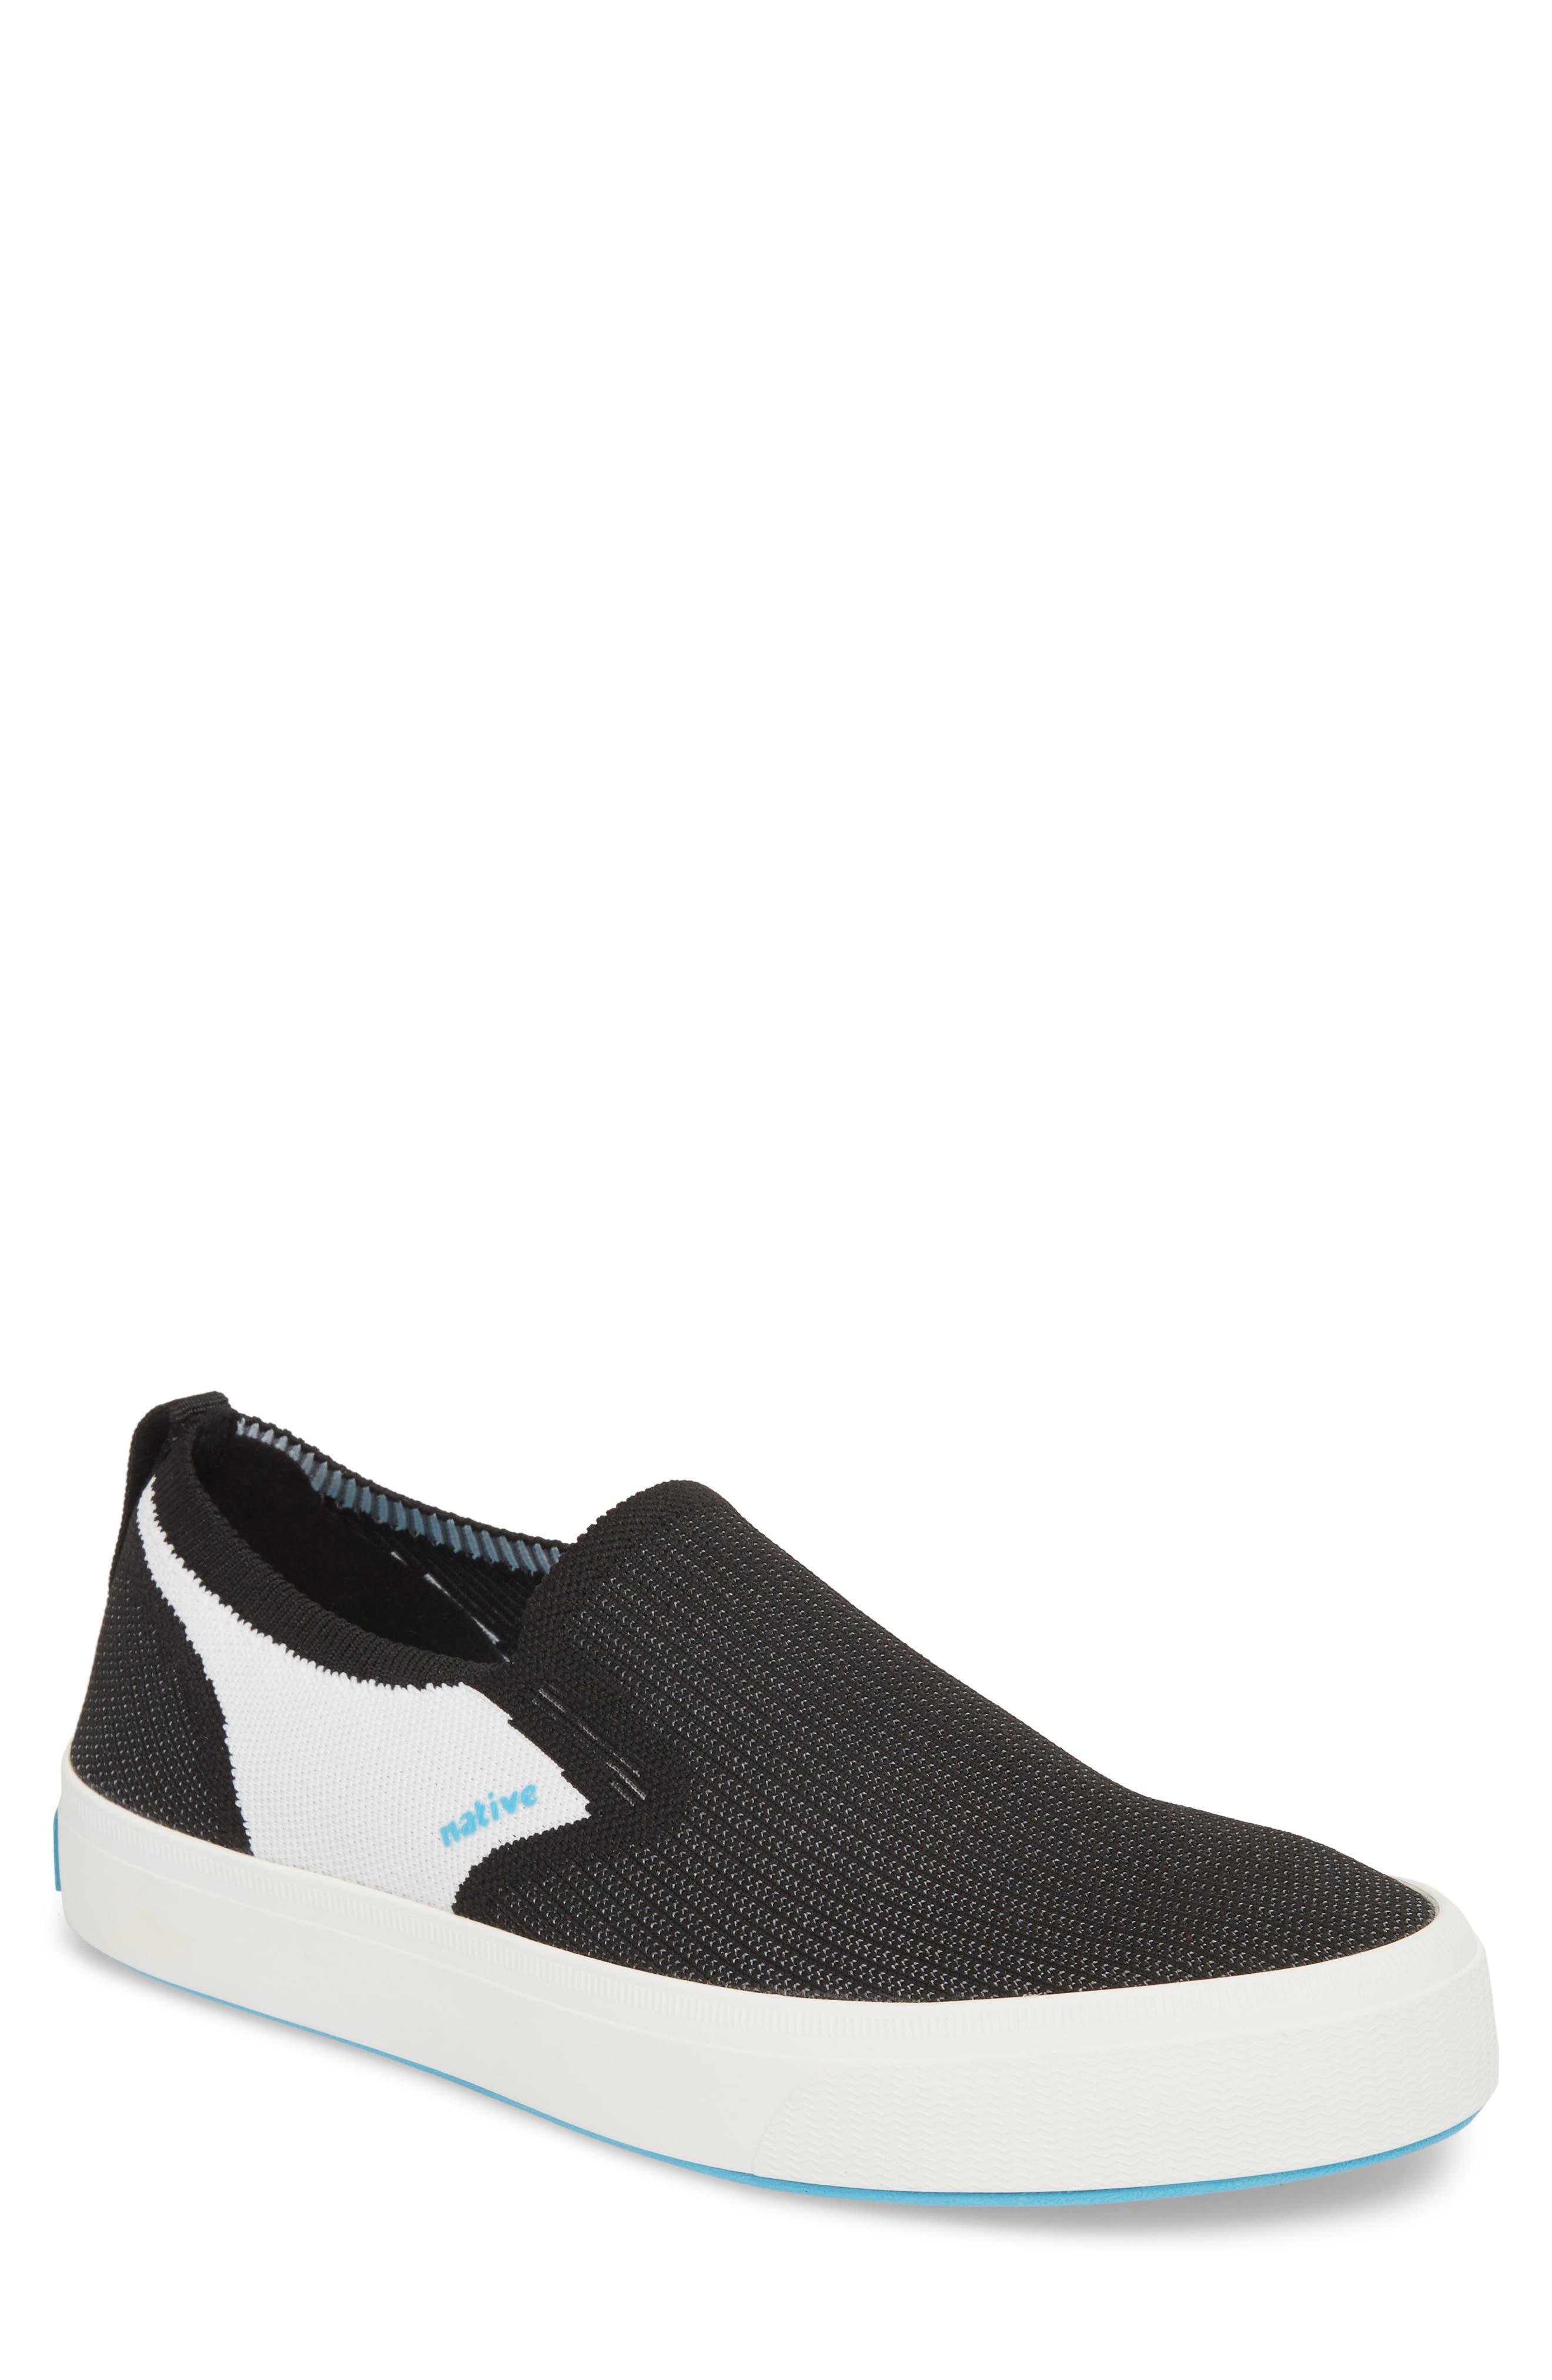 Native Miles LiteKnit Slip-On Sneaker,                             Main thumbnail 1, color,                             Jiffy Black/ Shell White